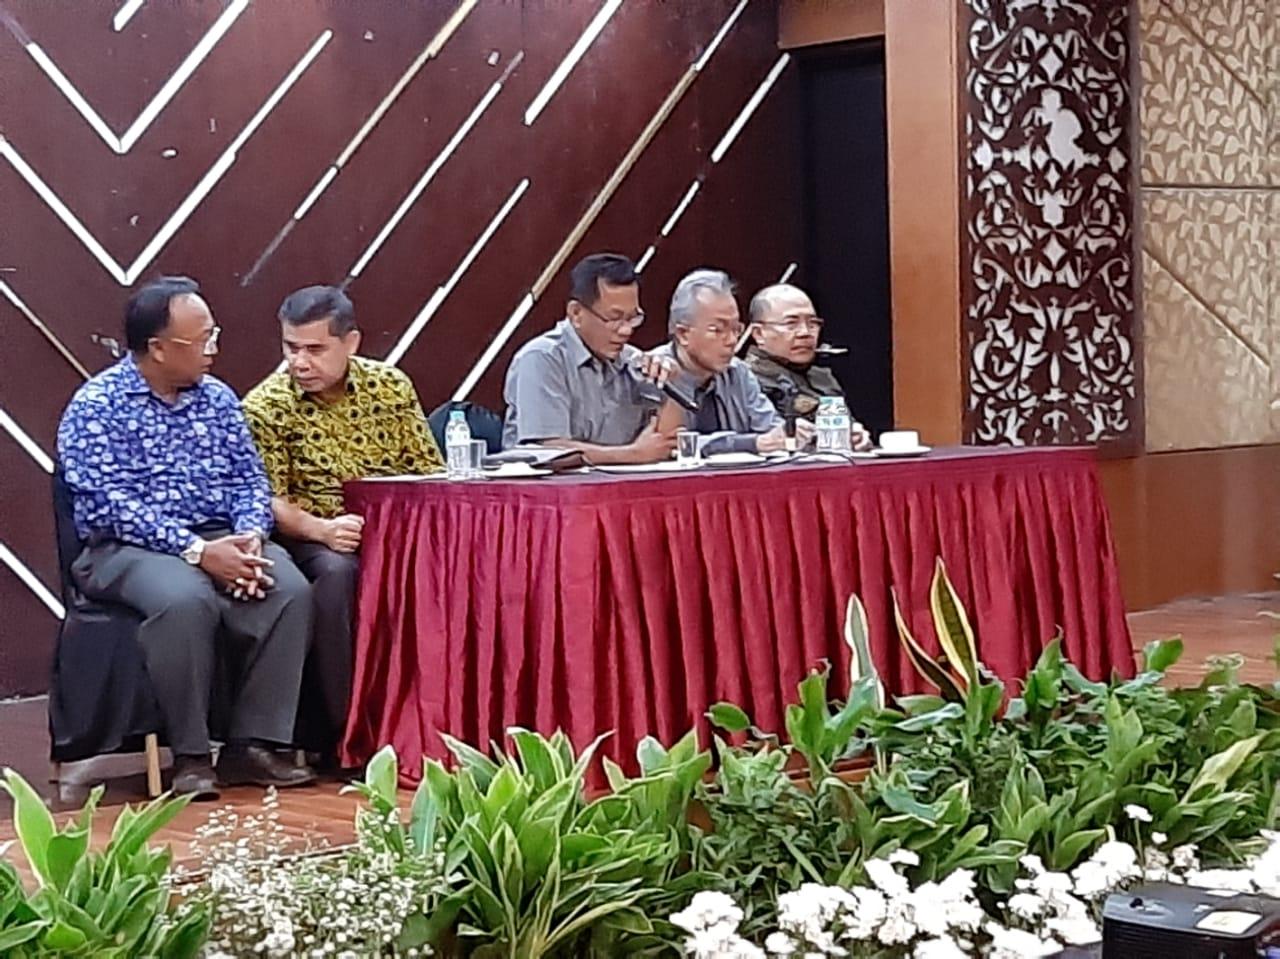 Keseriusan Pimpinan dalam Percepatan Pelaksanaan Reformasi Birokrasi Provinsi Sumatera Barat